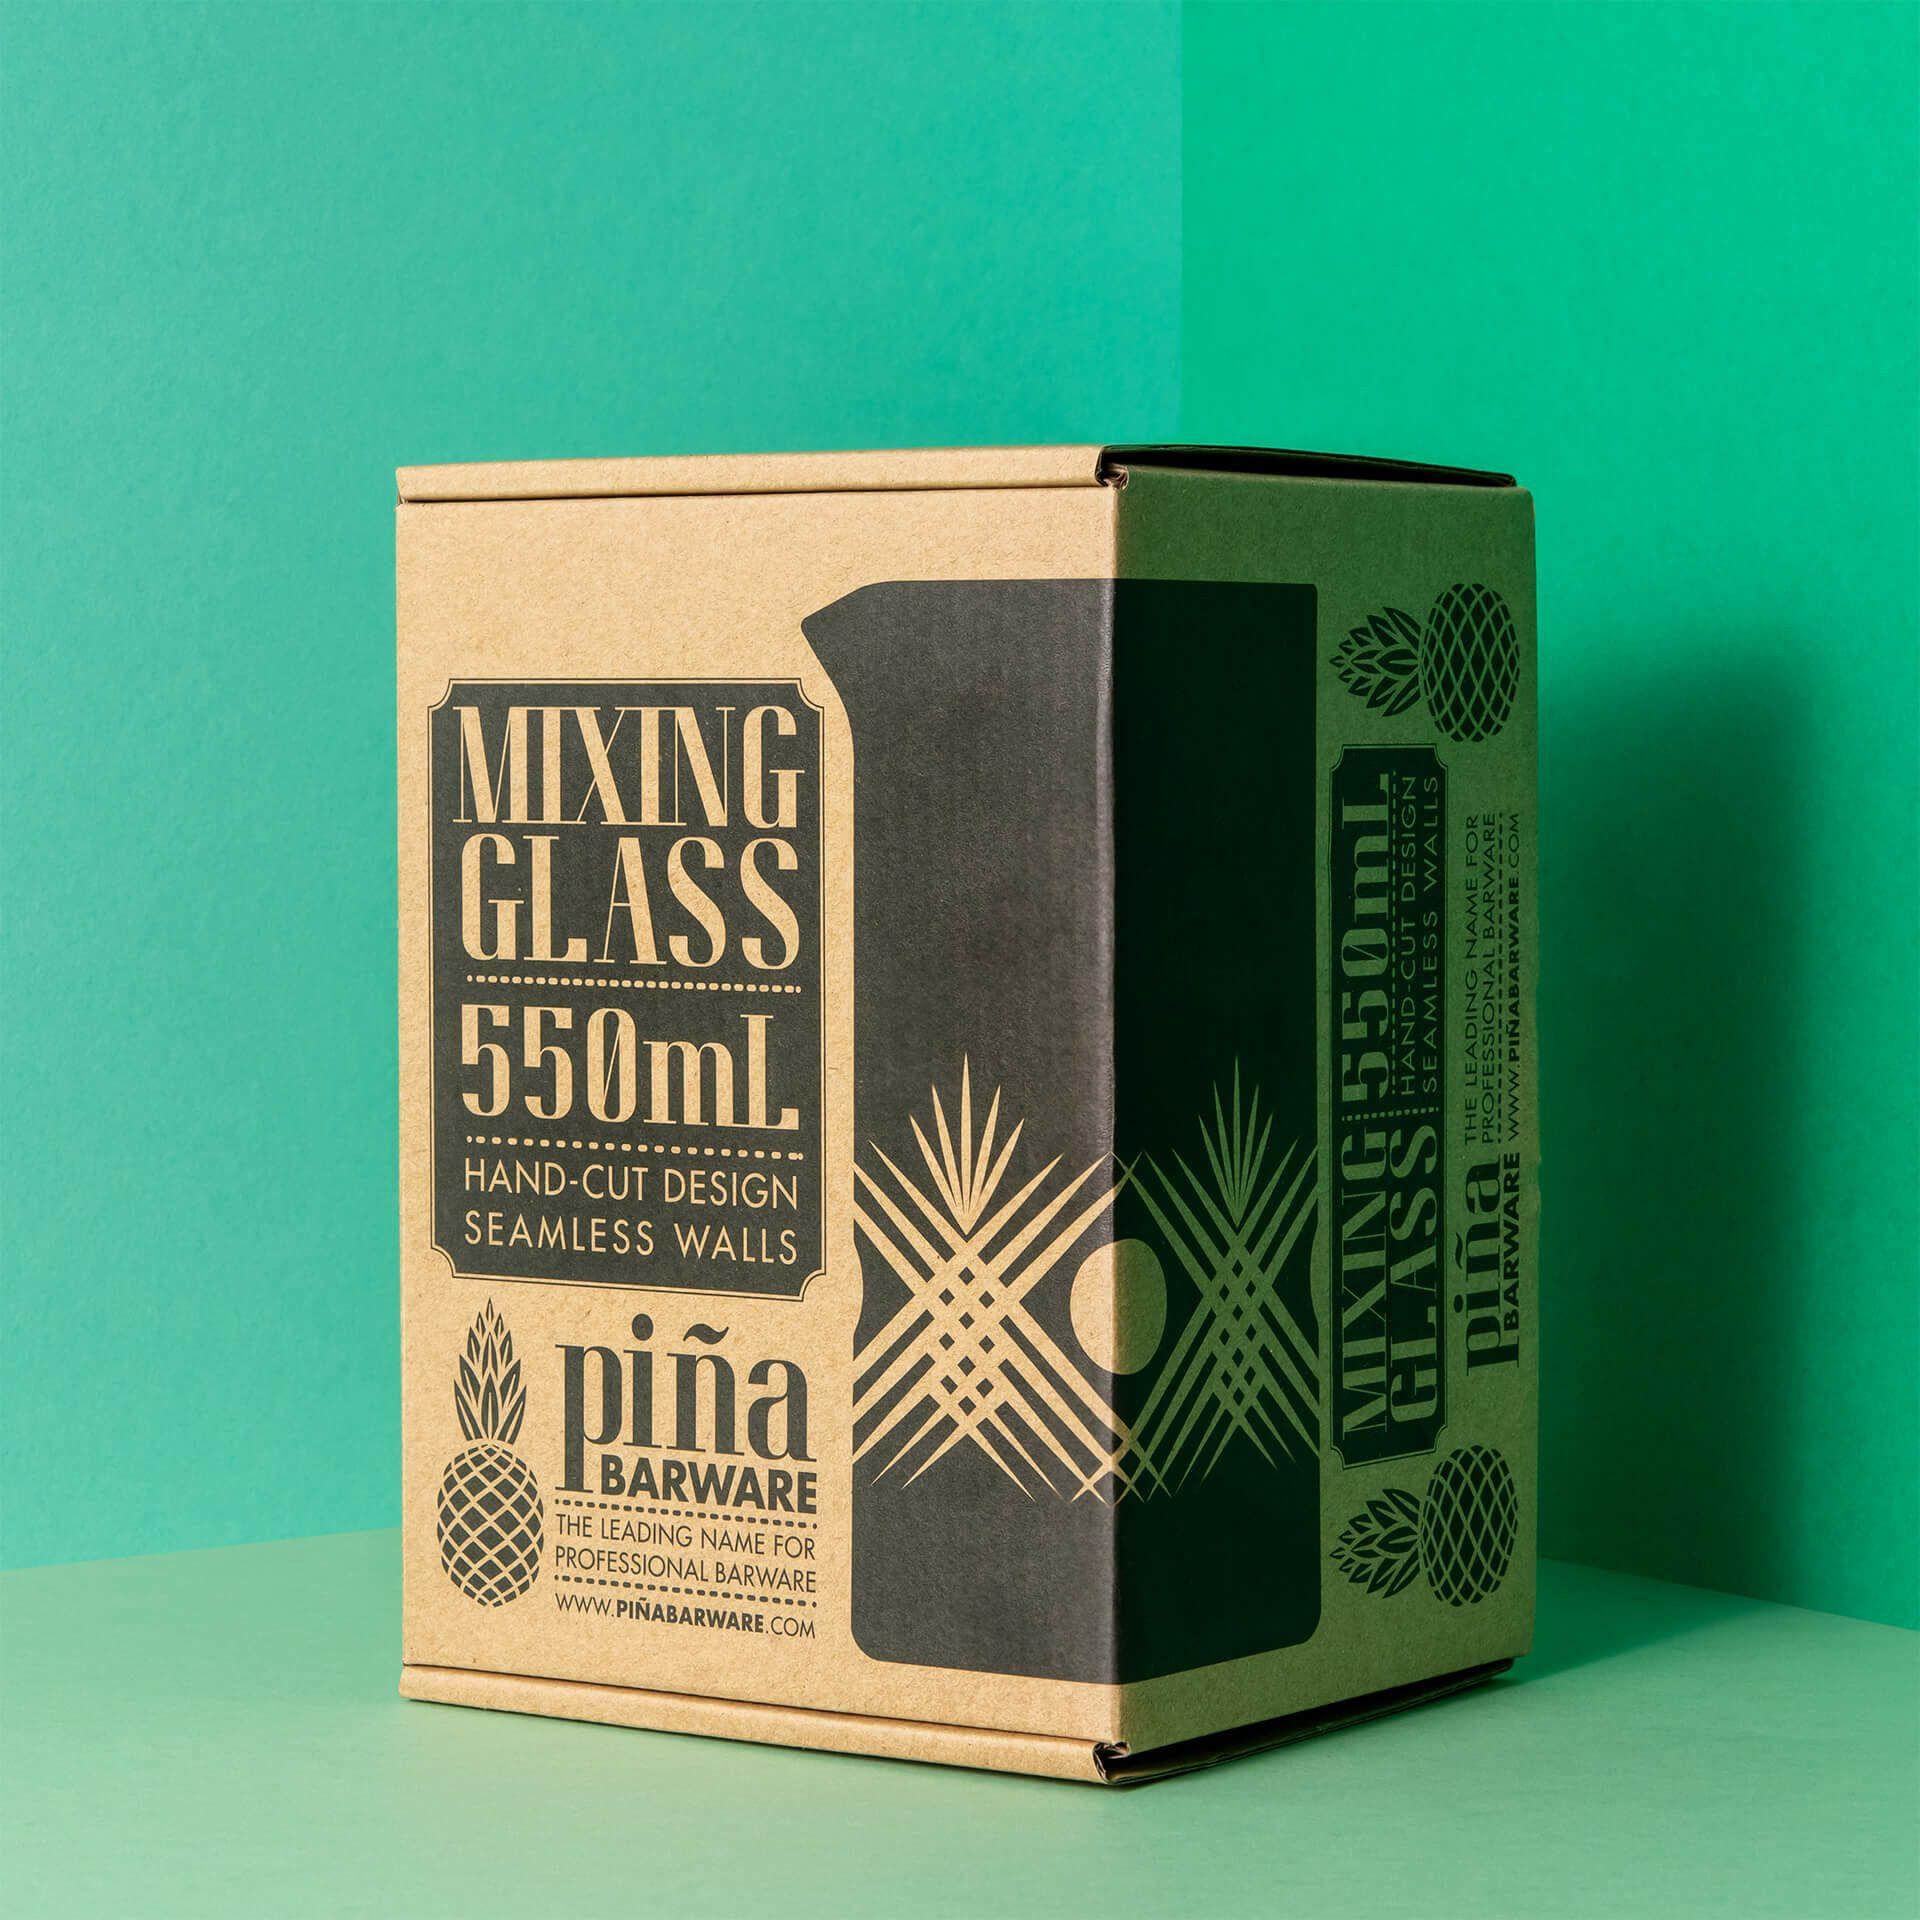 Pina Rührglas Cocktail Mixing Glass - Drink Syndikat Bartools